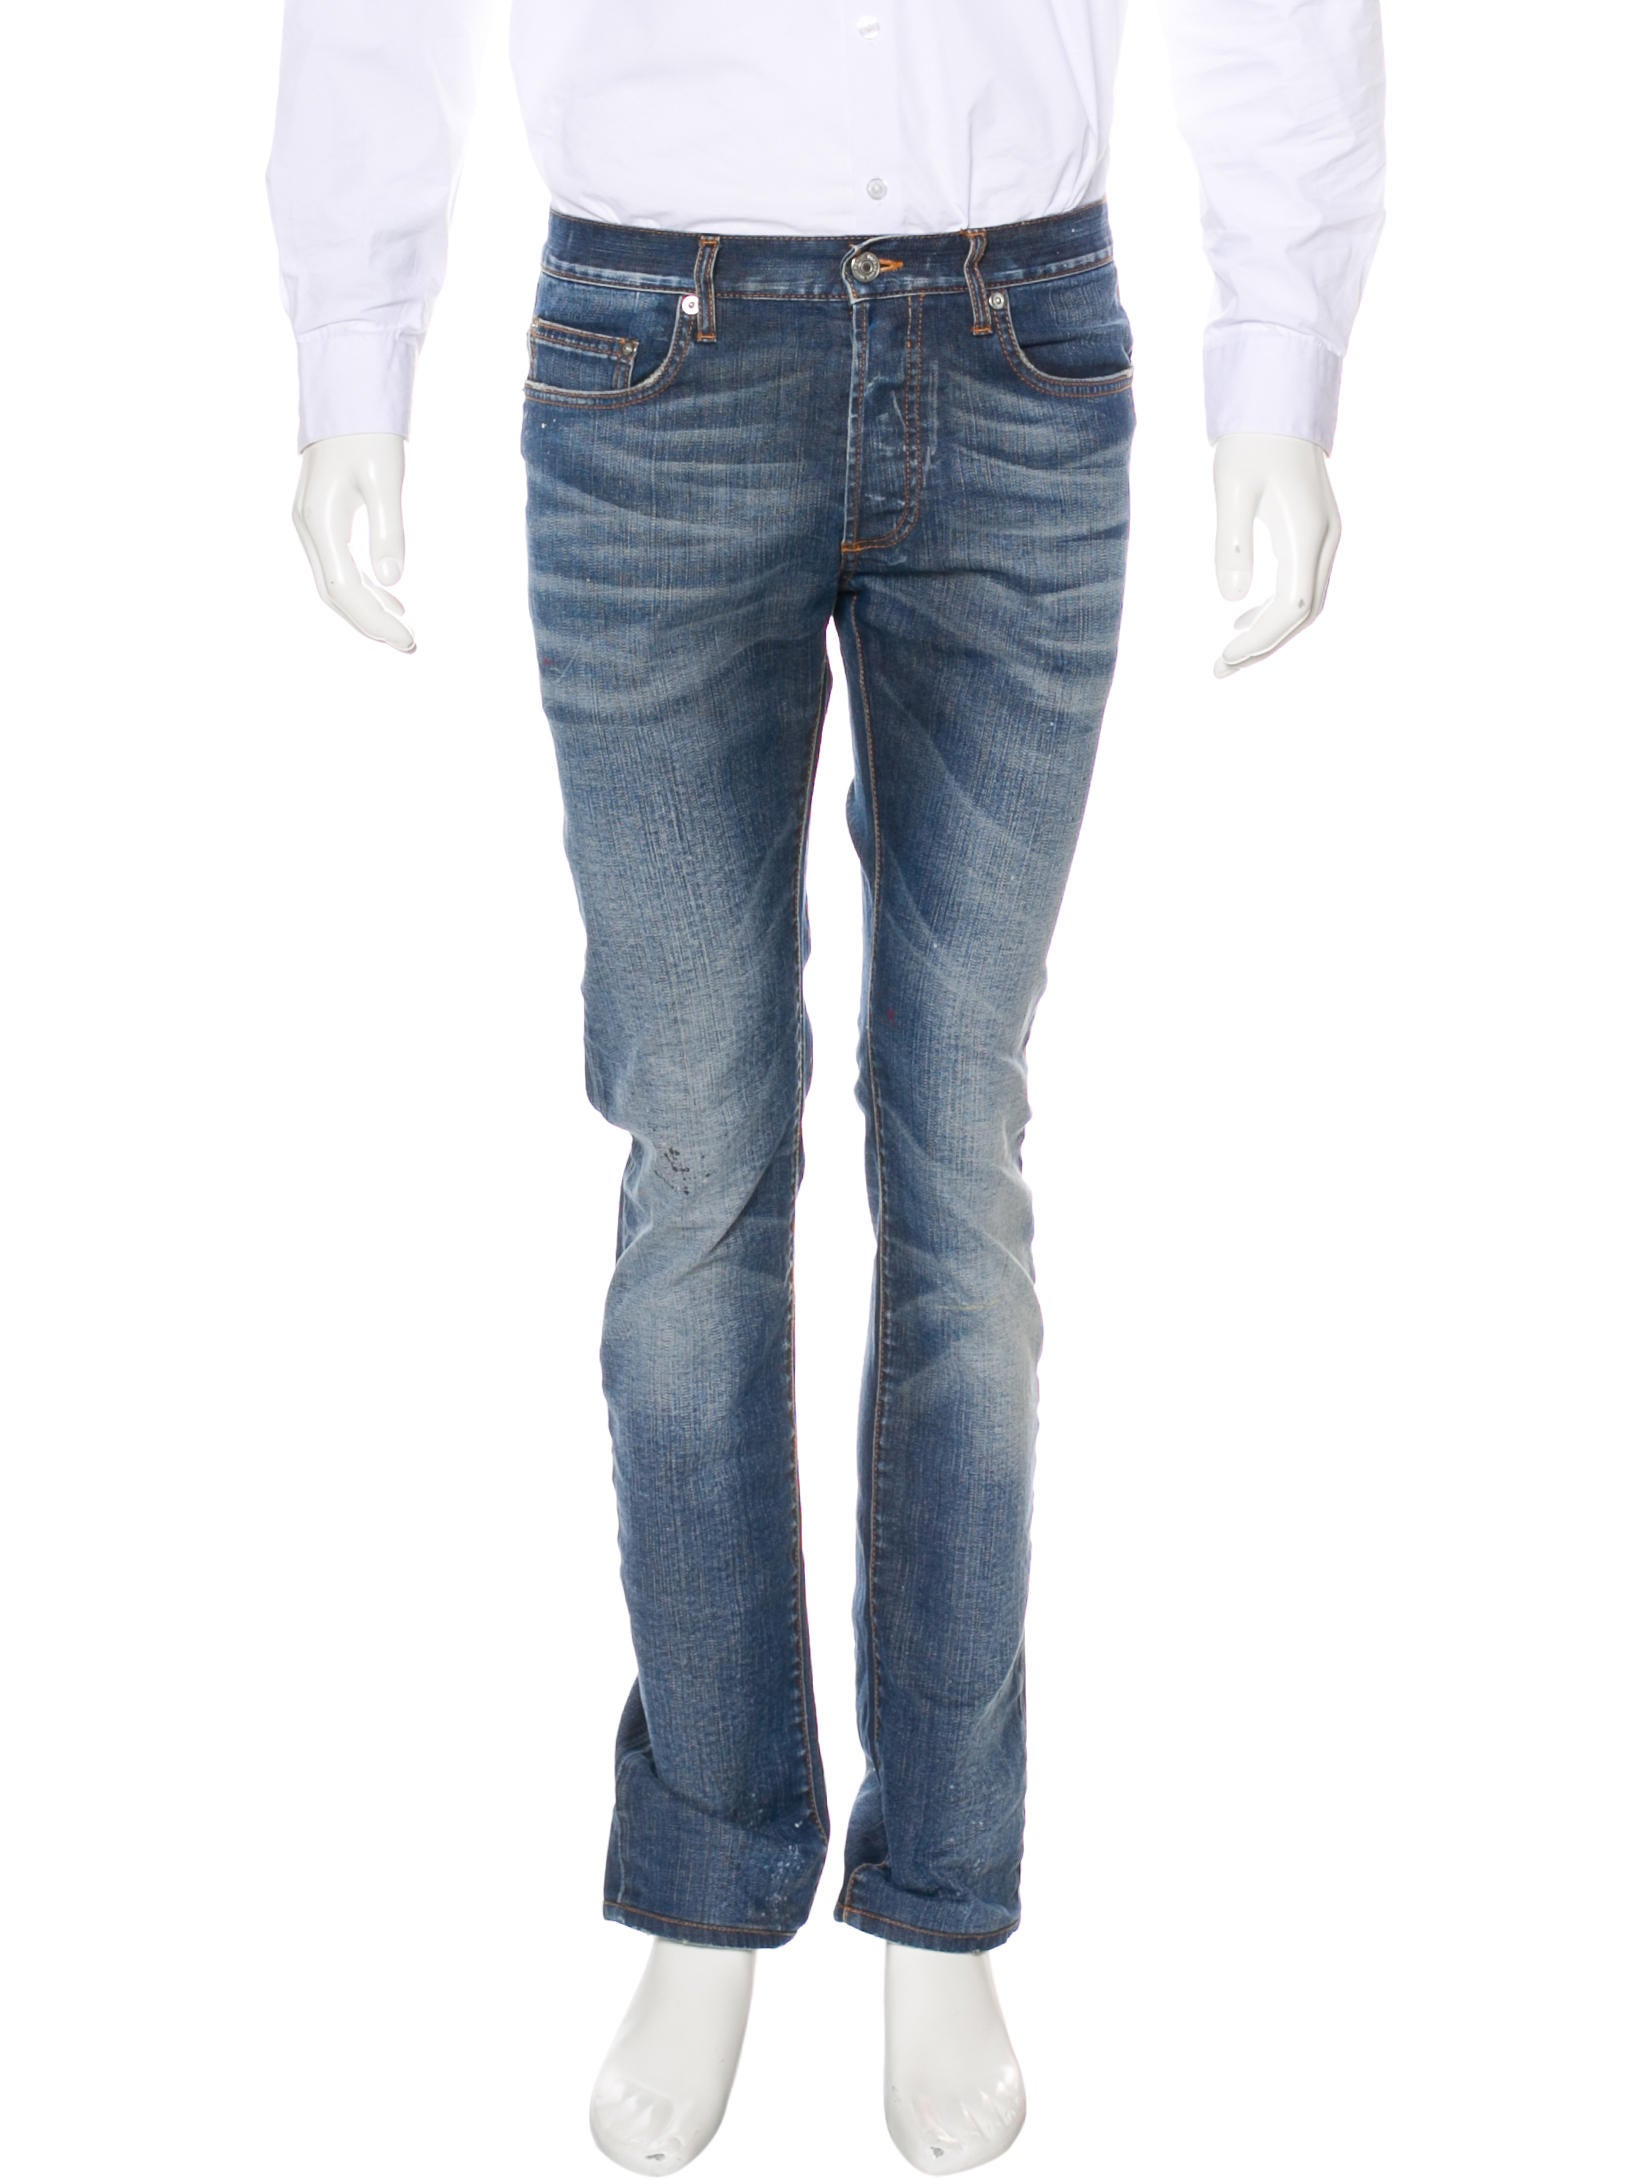 dior homme slim fit jeans clothing hmm23735 the realreal. Black Bedroom Furniture Sets. Home Design Ideas